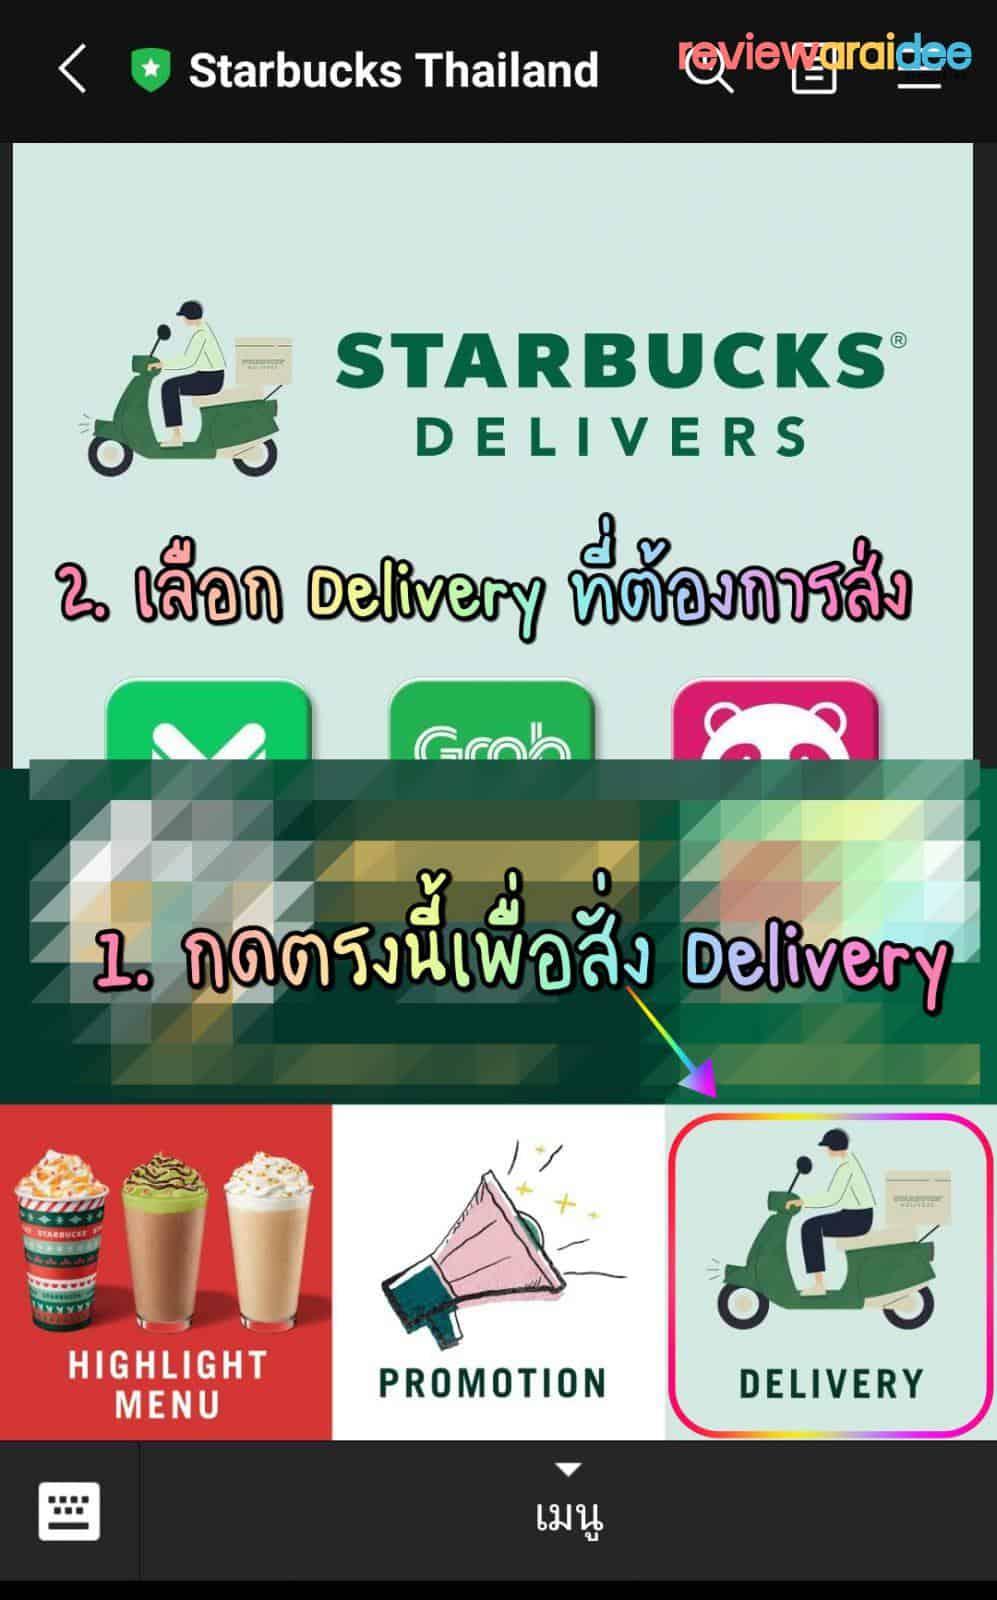 [code ส่วนลด starbuck] สั่งเครื่องดื่มและขนม ร้านสตาร์บัคส์ ผ่าน foodpanda ใน line สตาร์บัคส์